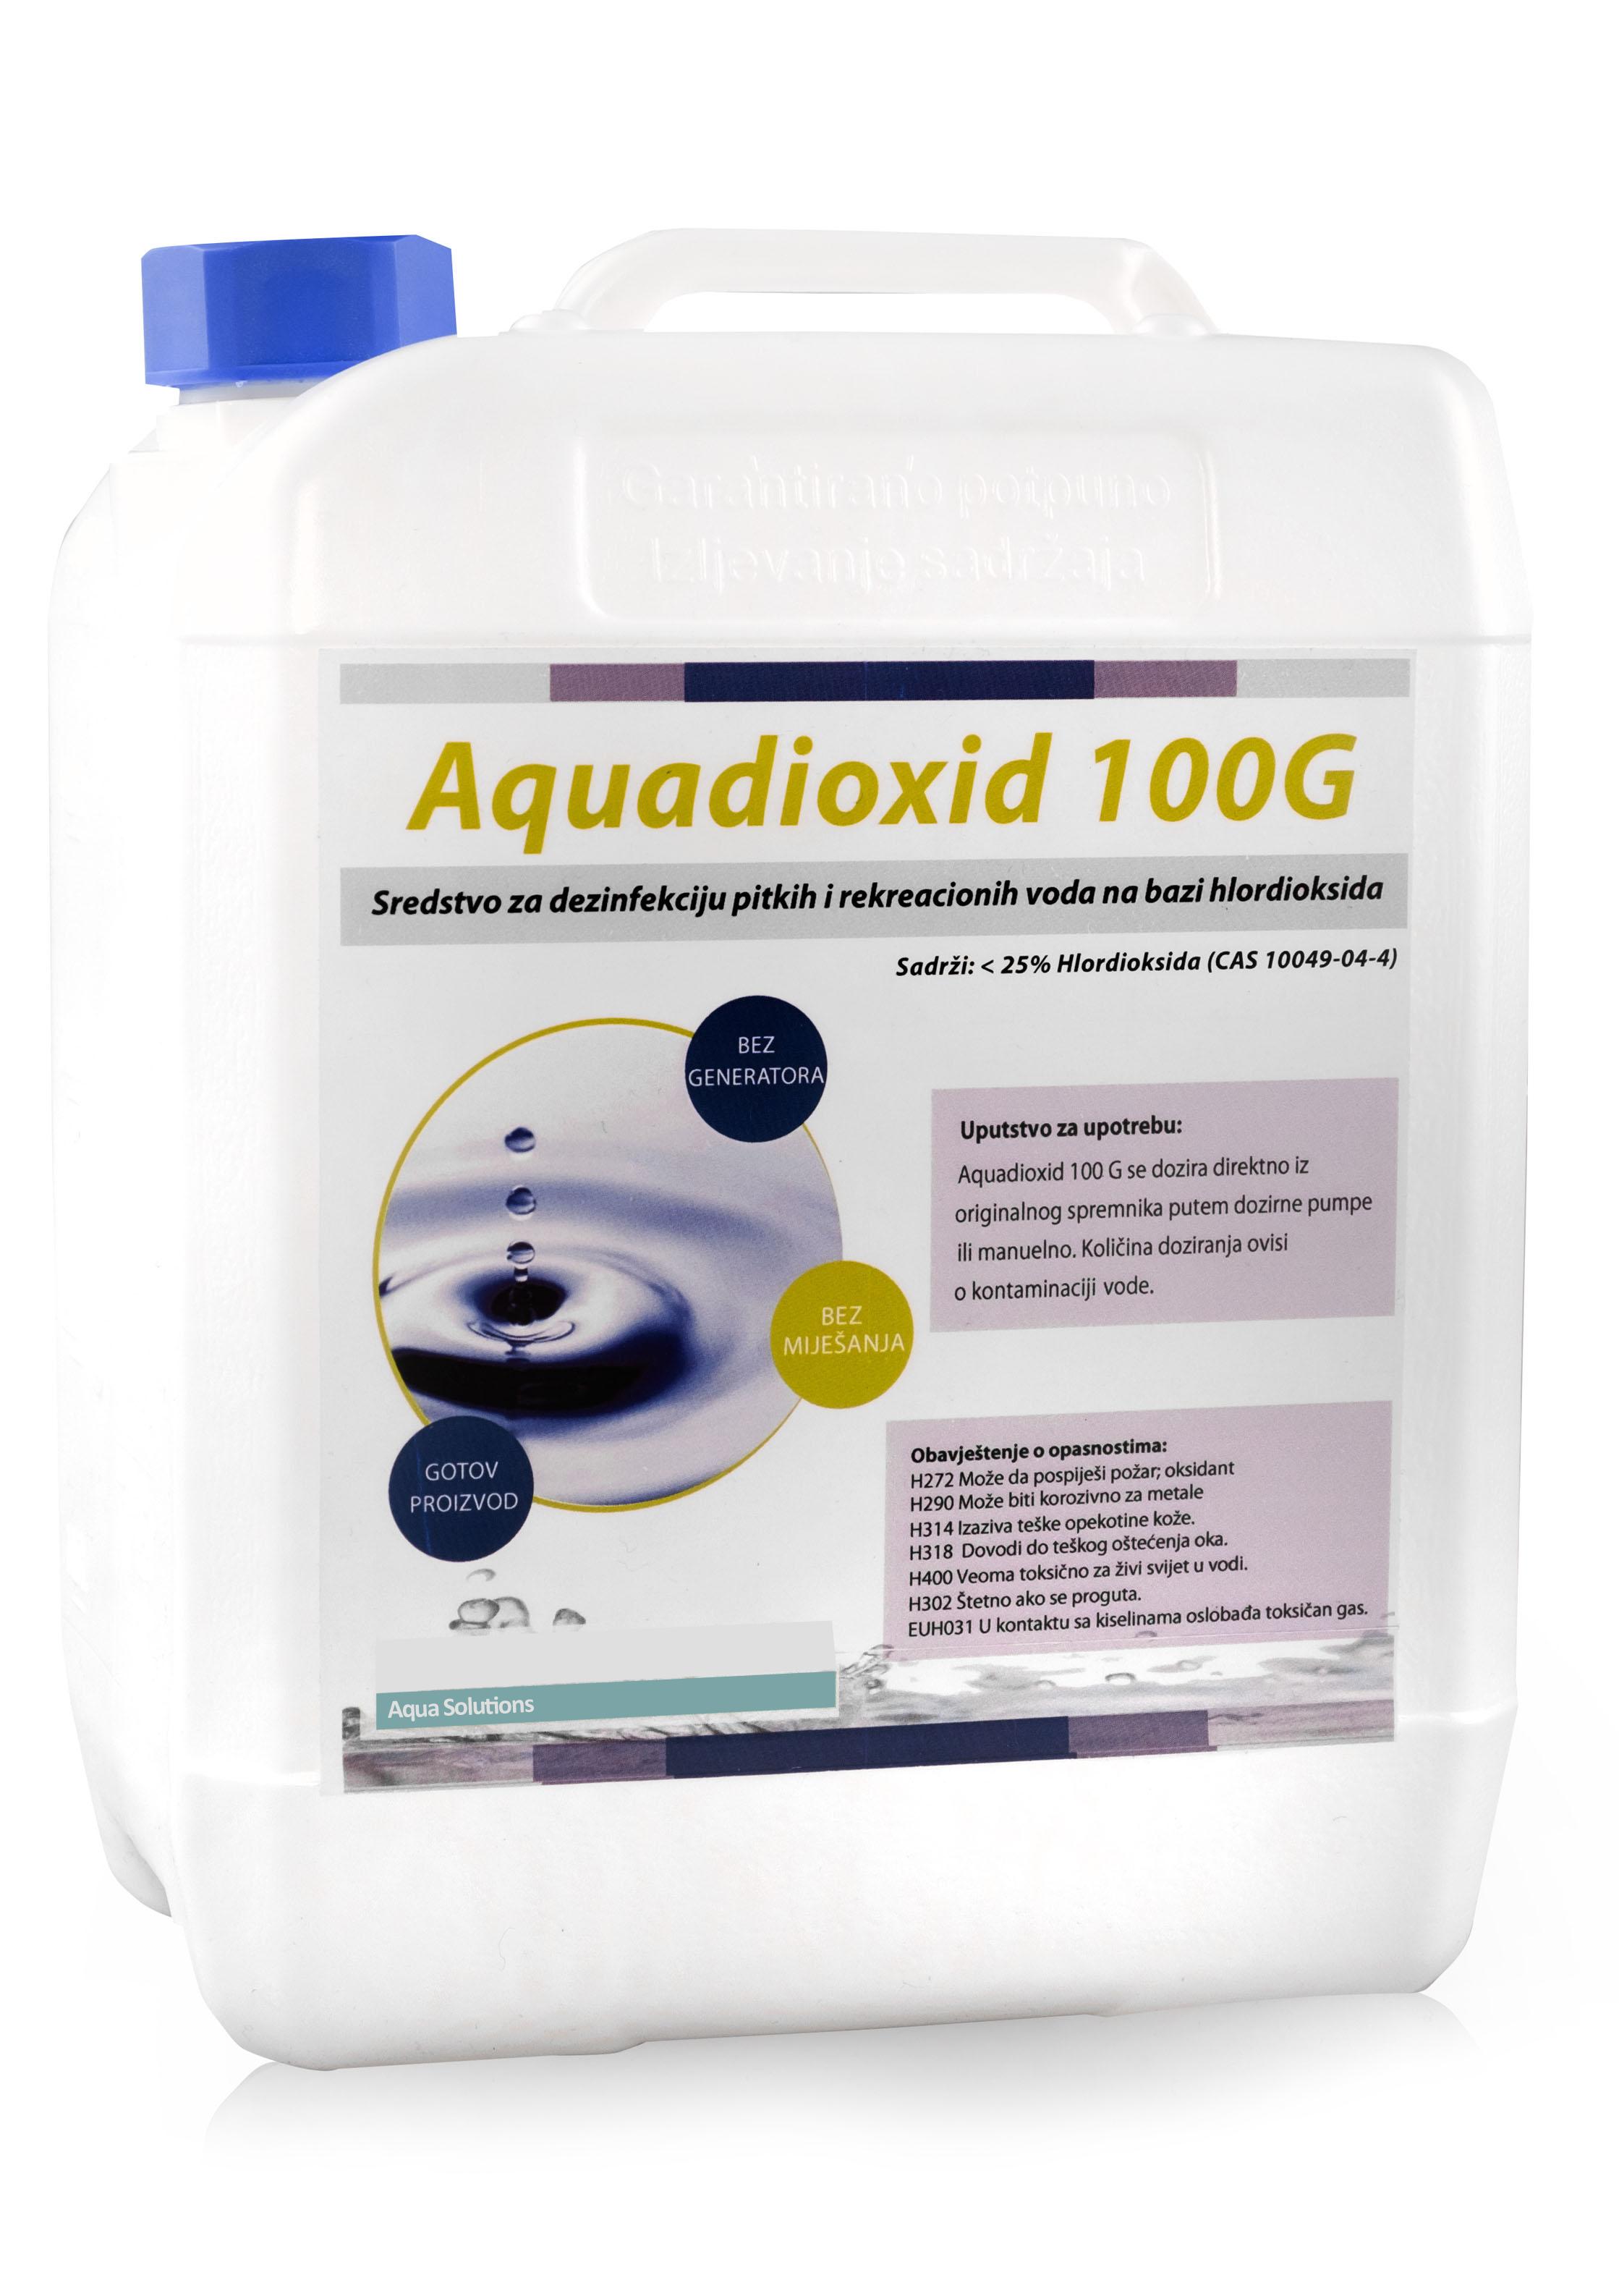 Aquadioxid-bez-sjenke-home